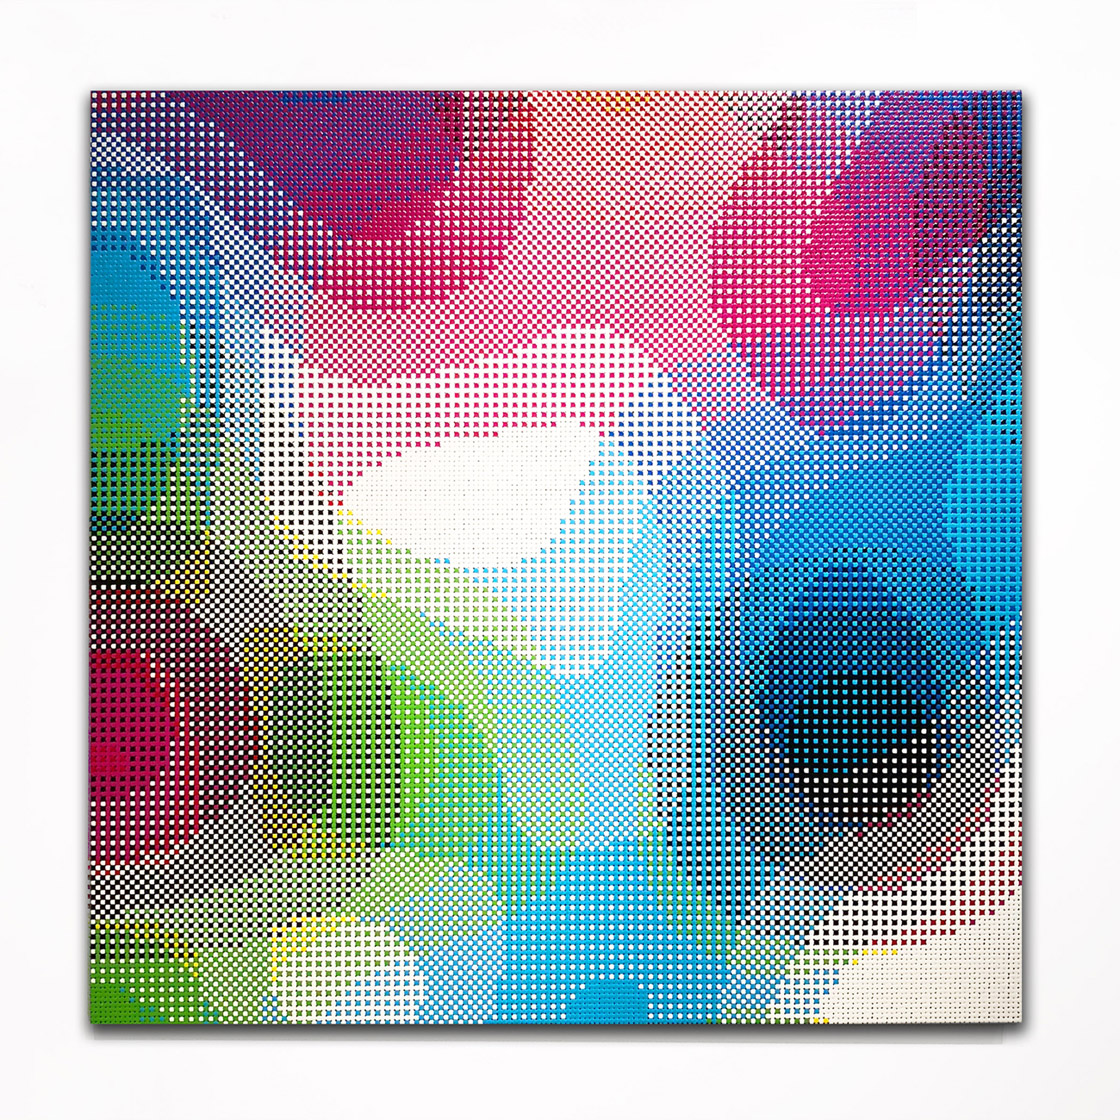 William Betts, Unicorn, 36 x 36 inches, 2017